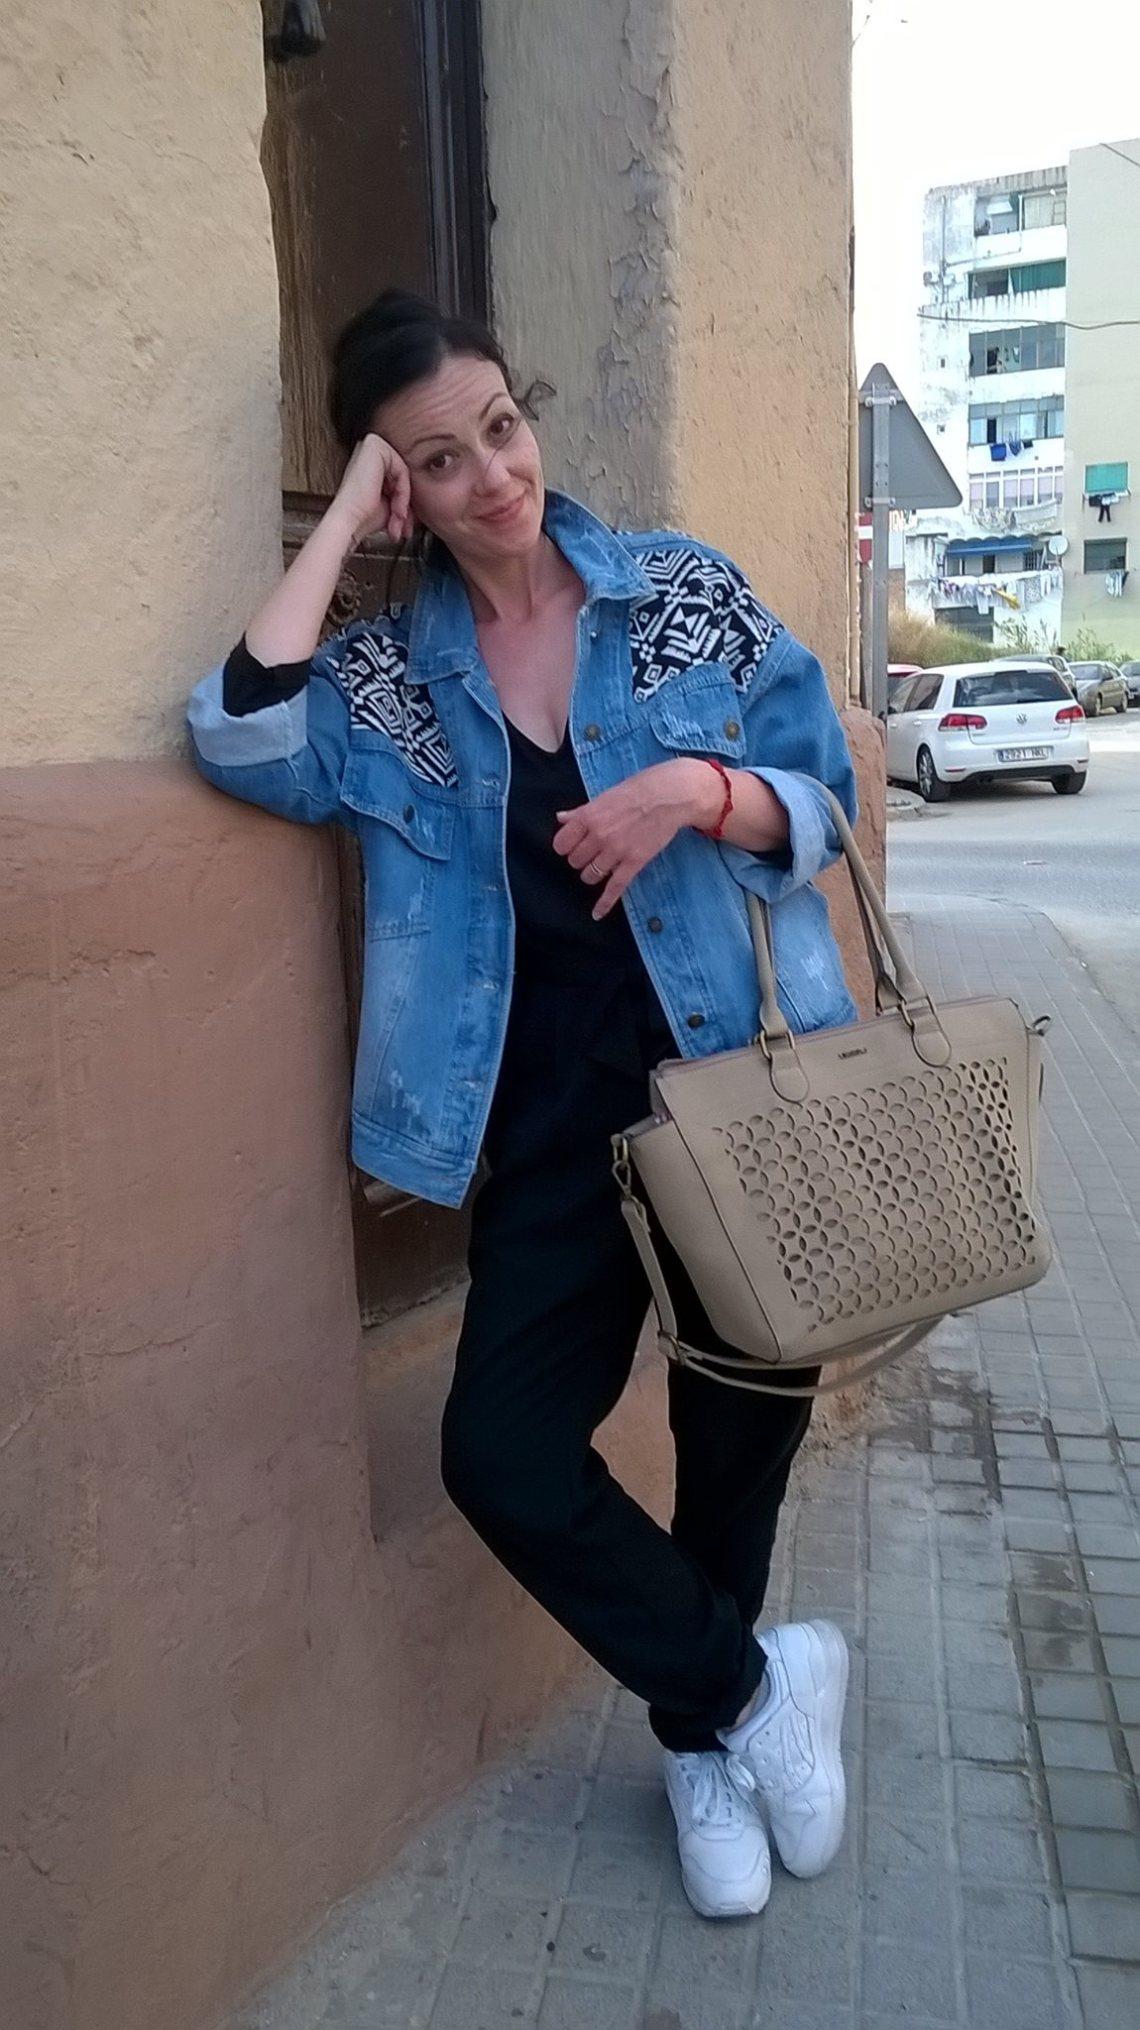 oewe  galeria loewe coleccion ss15 normcore girl lujo comodo comfy